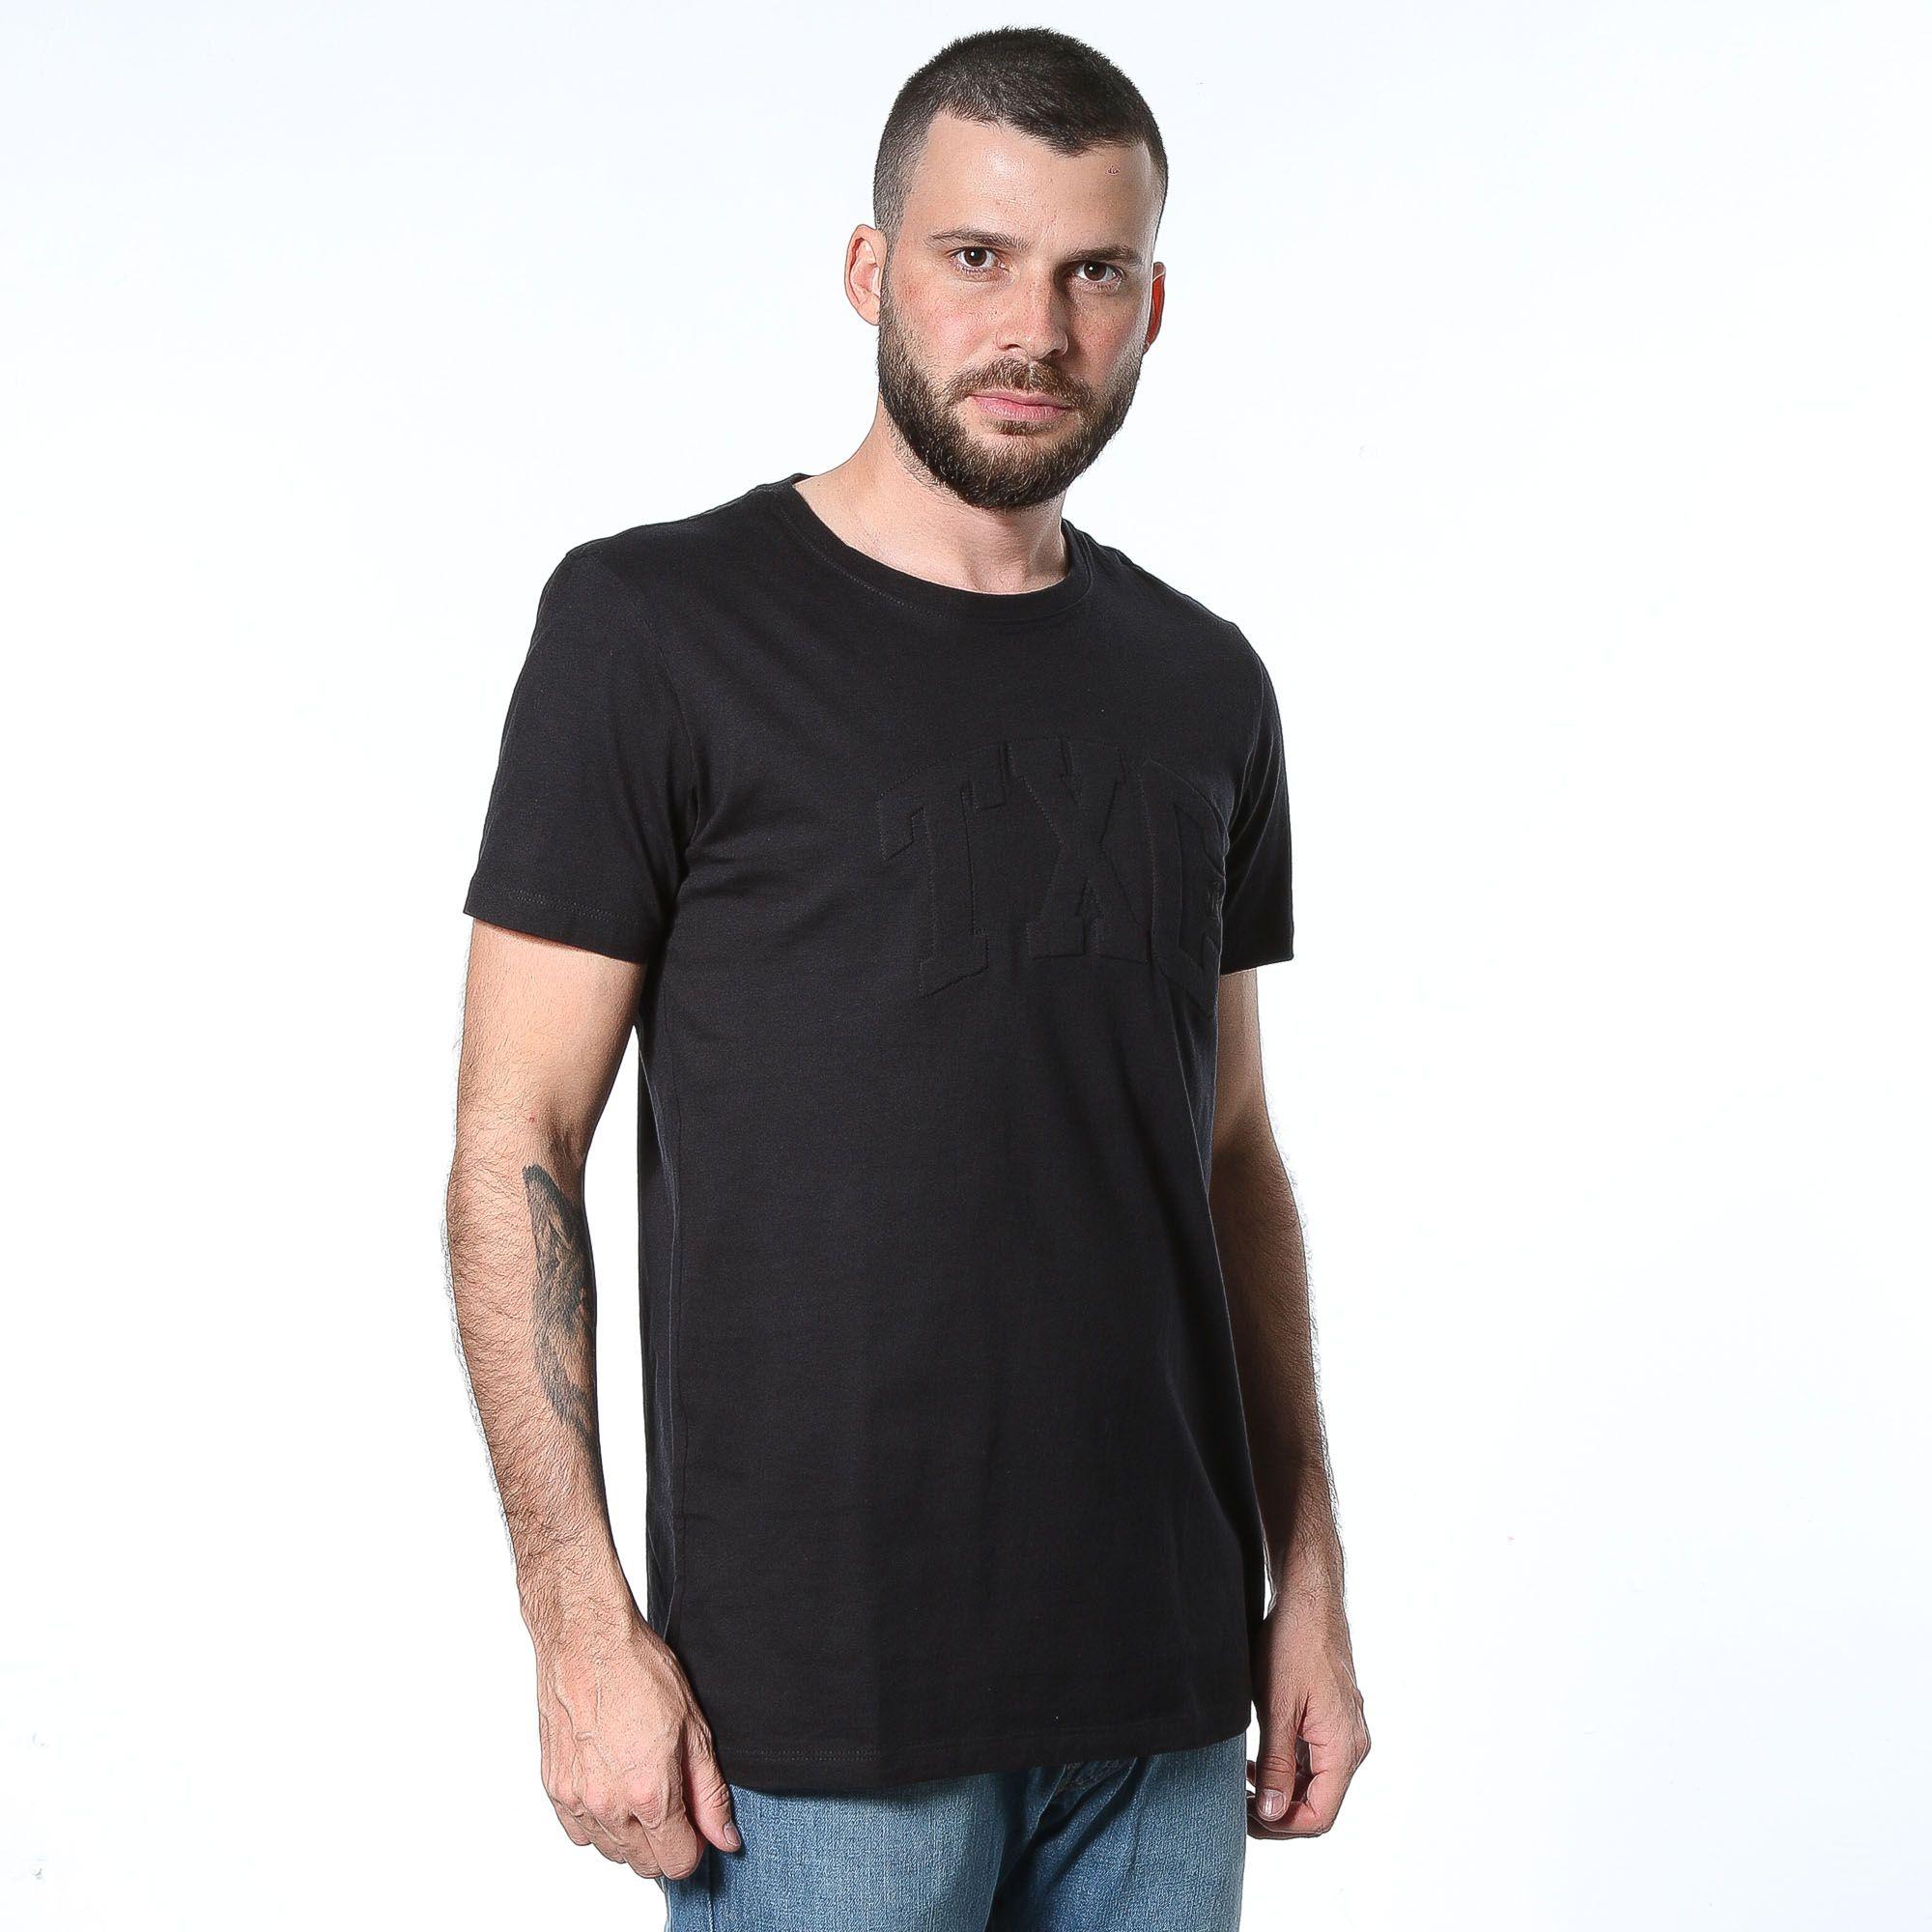 Camiseta Masculina TXC 1814